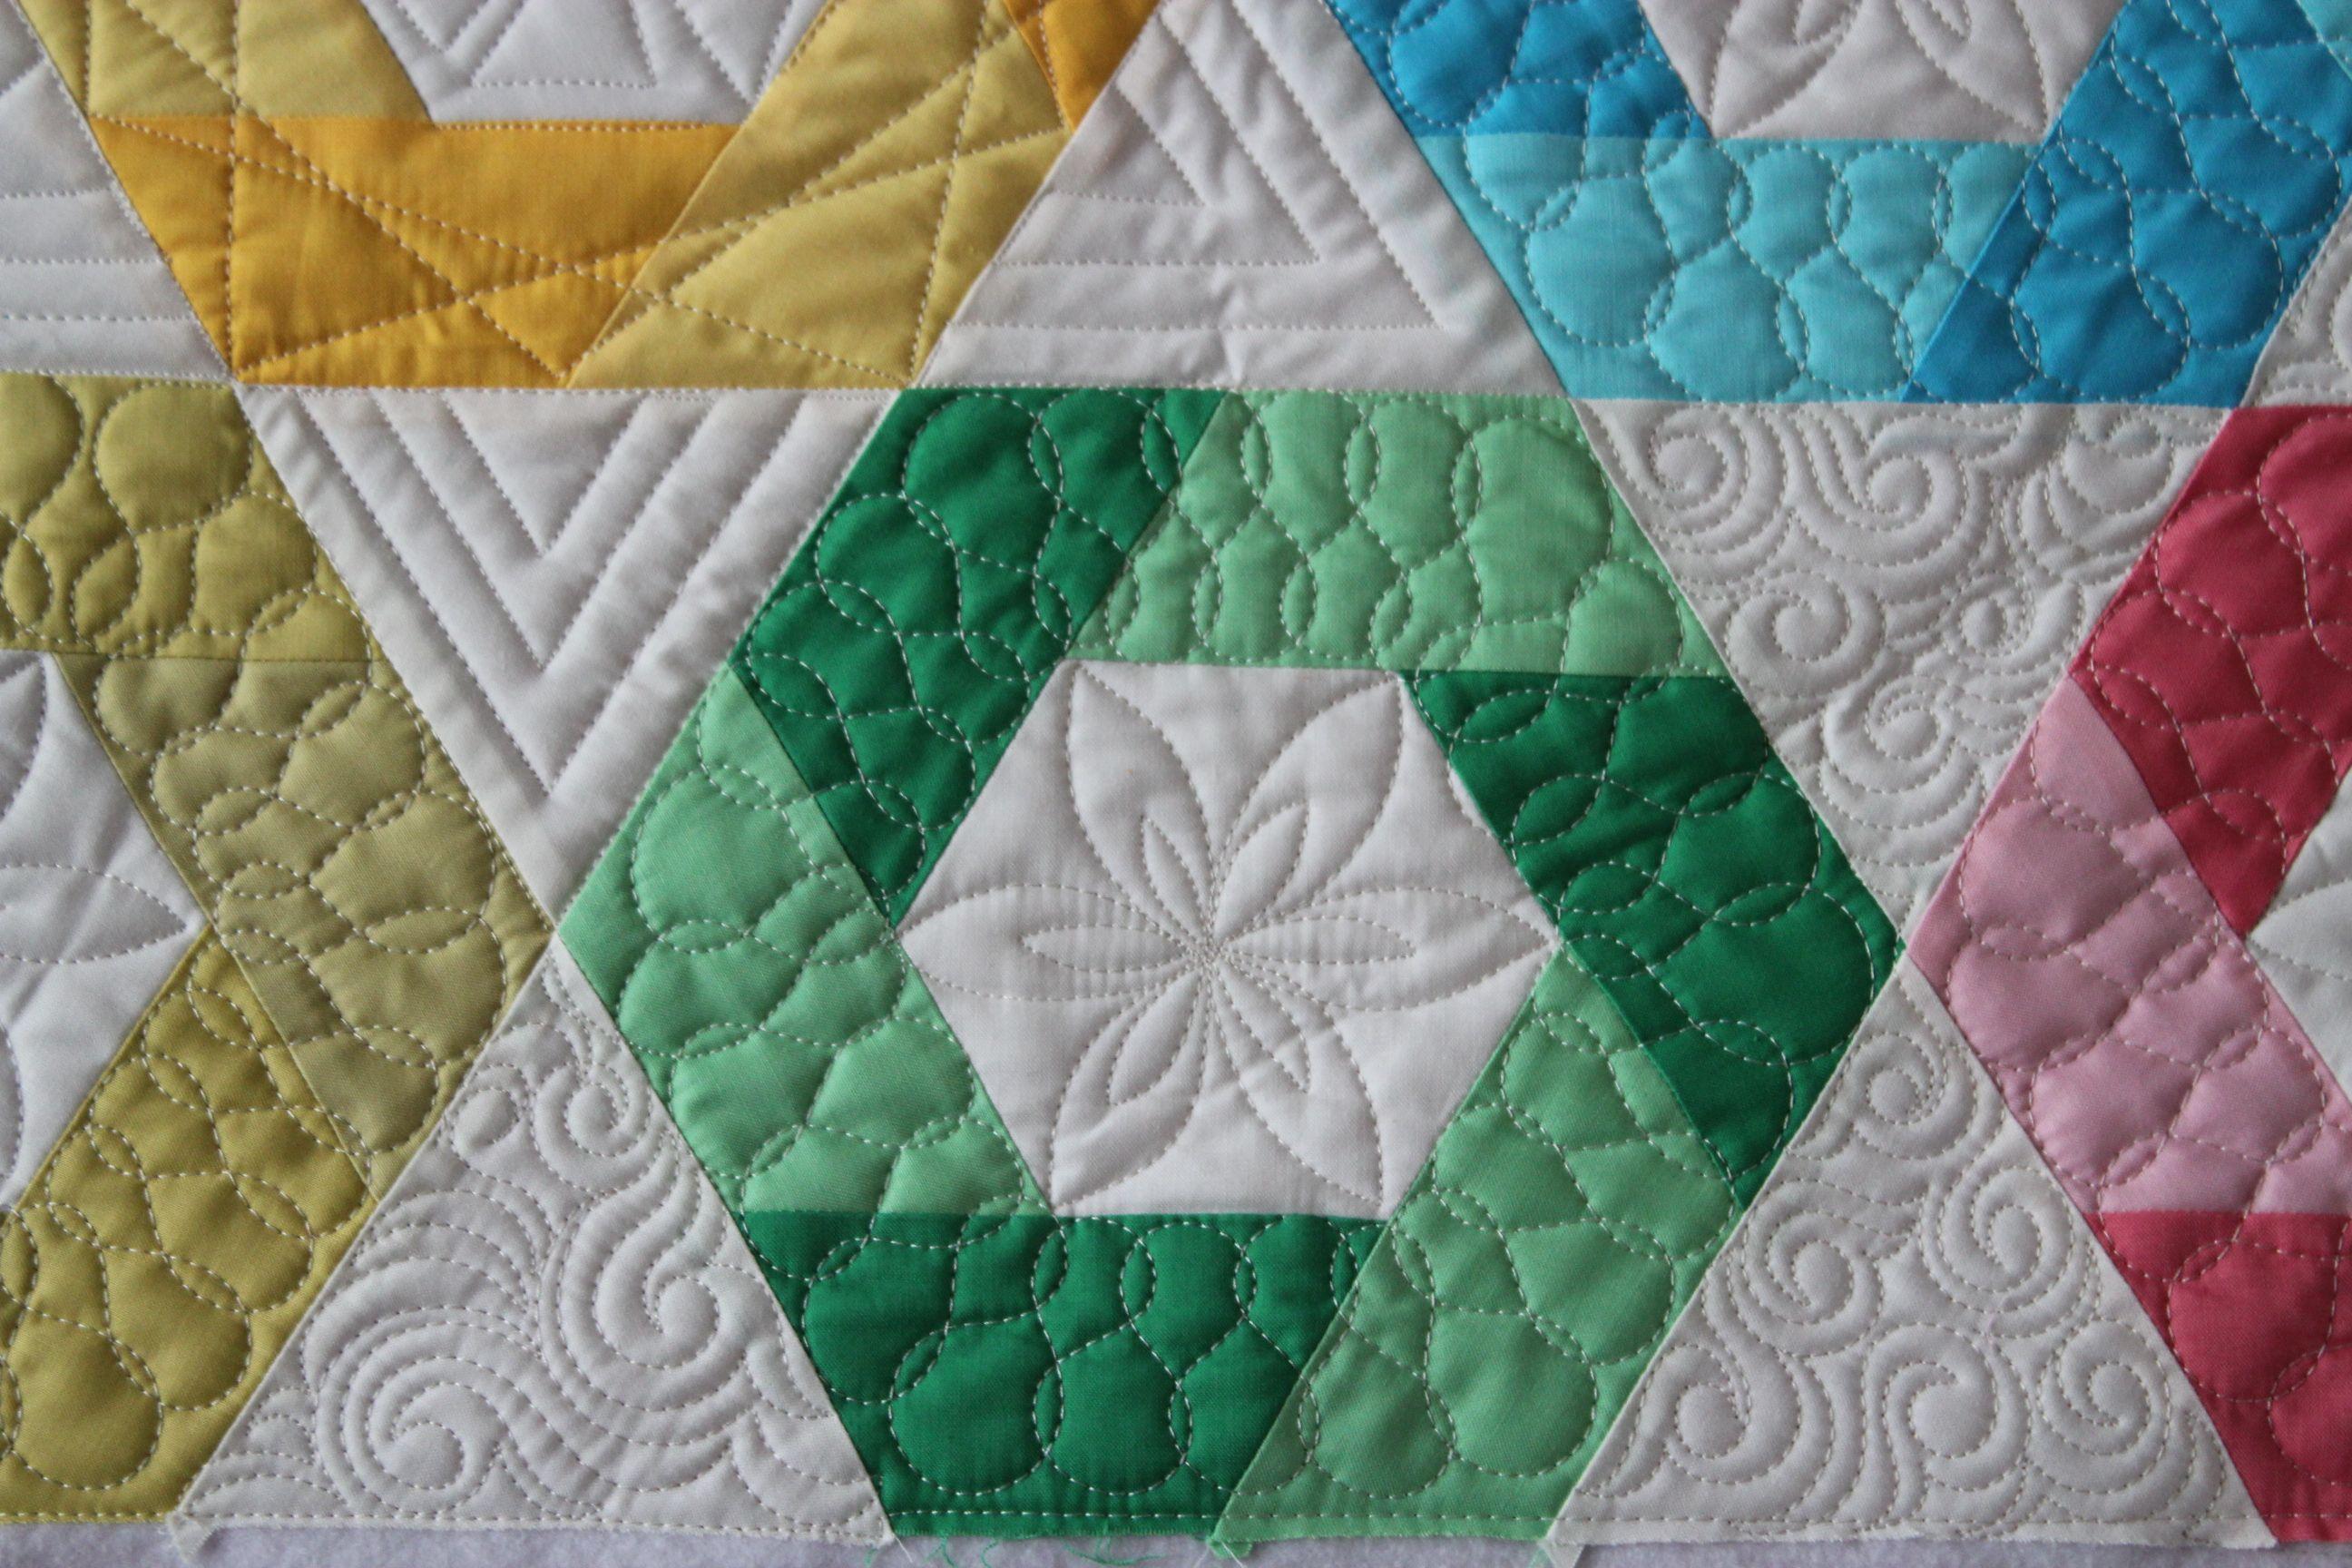 Hexagon Quilt Block Pattern Candy quilting pattern | Fabric ... : hexagon quilting patterns - Adamdwight.com